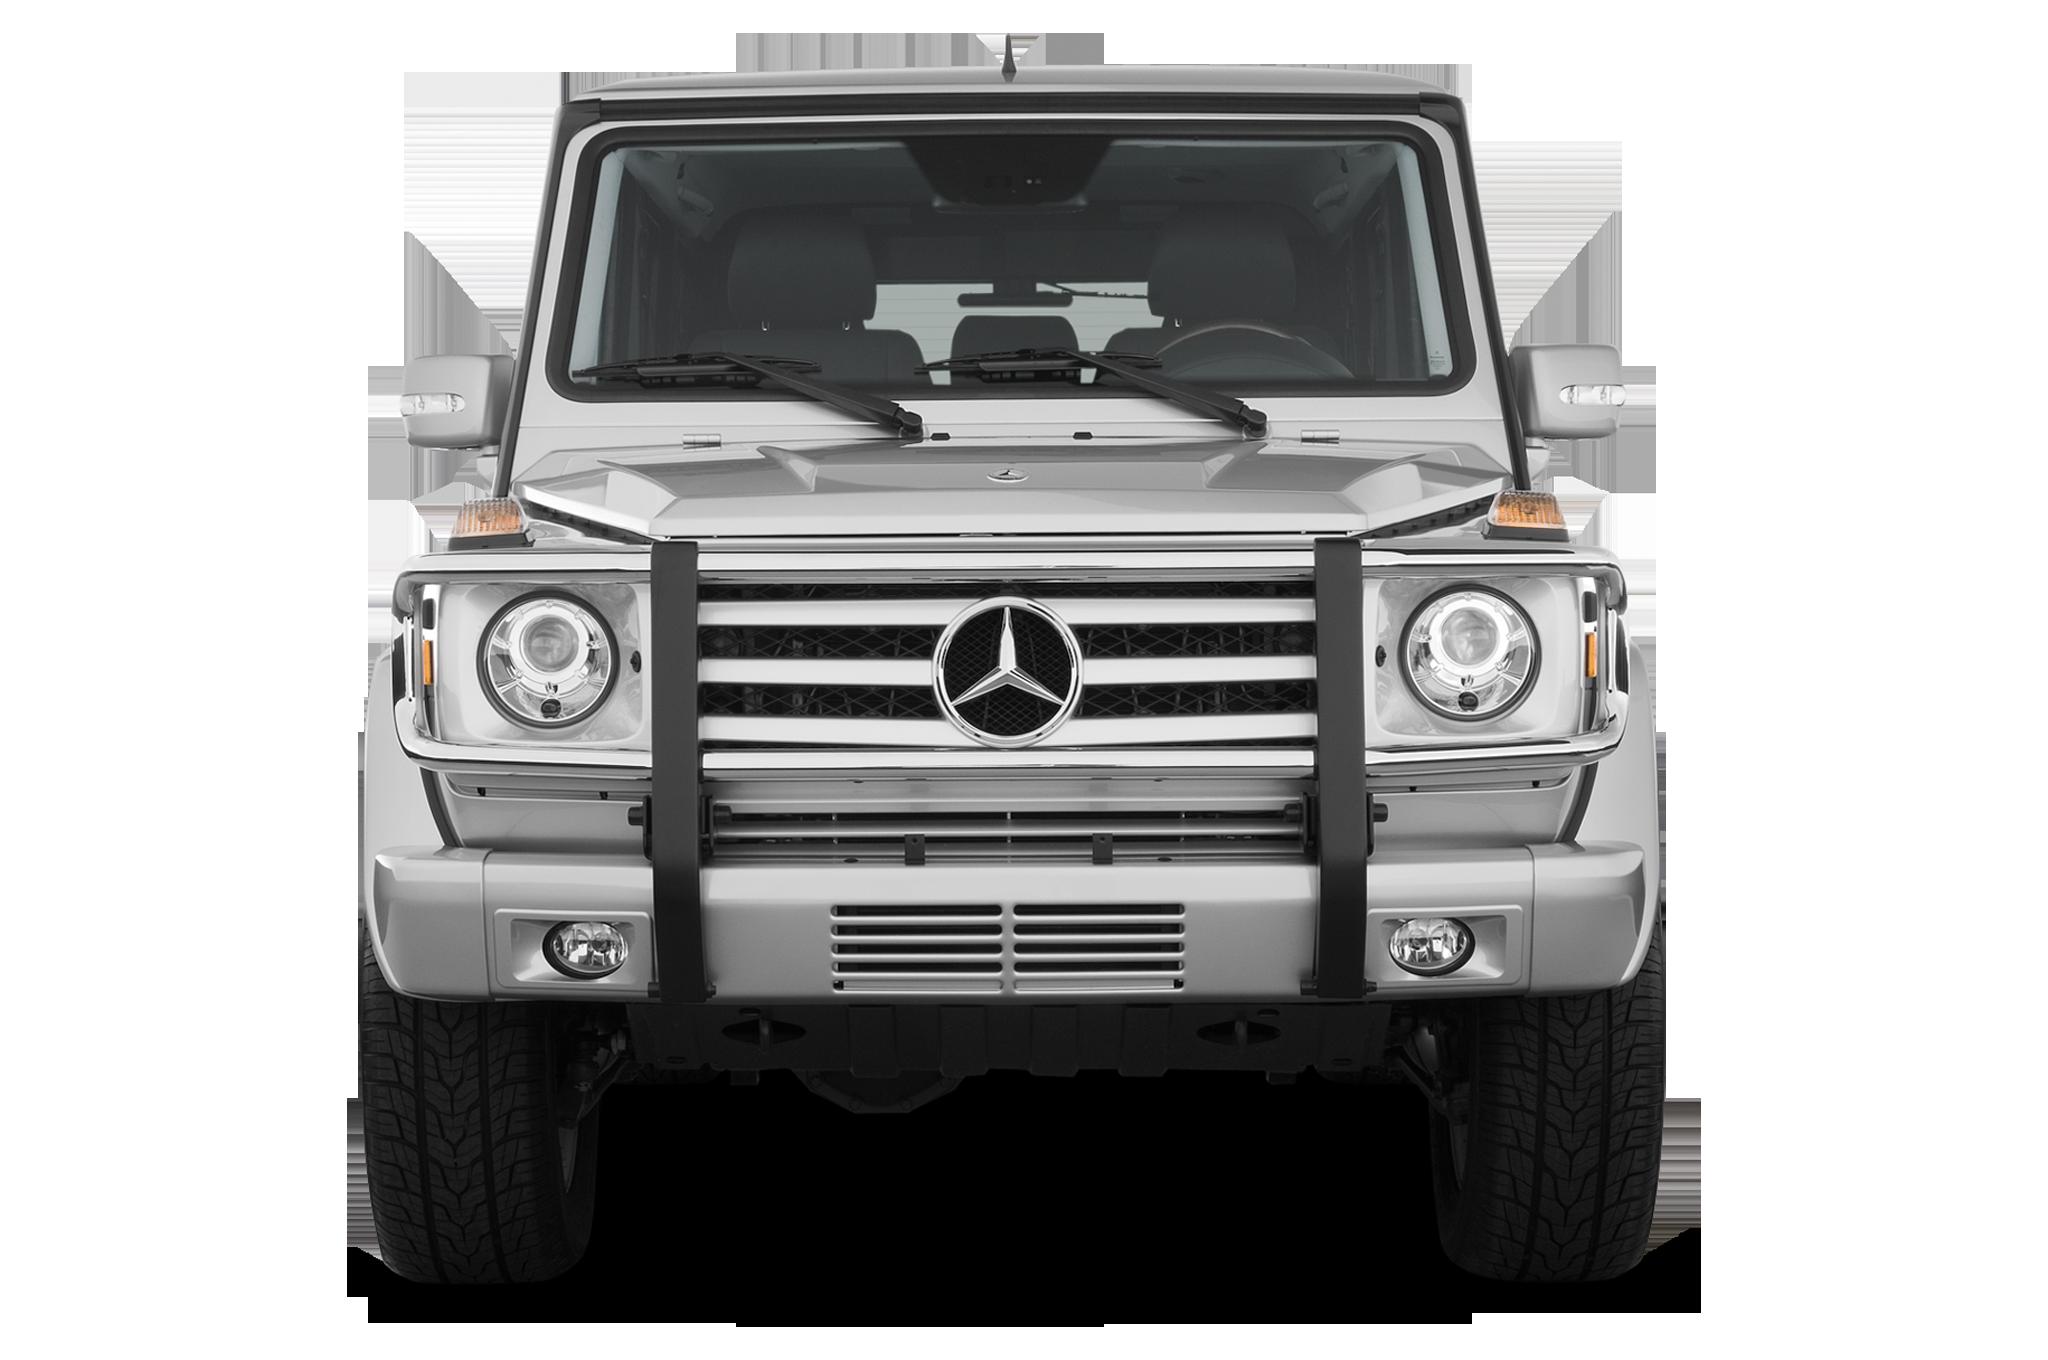 Mercedes Benz Planning Bmw X6 Like Gls Suv